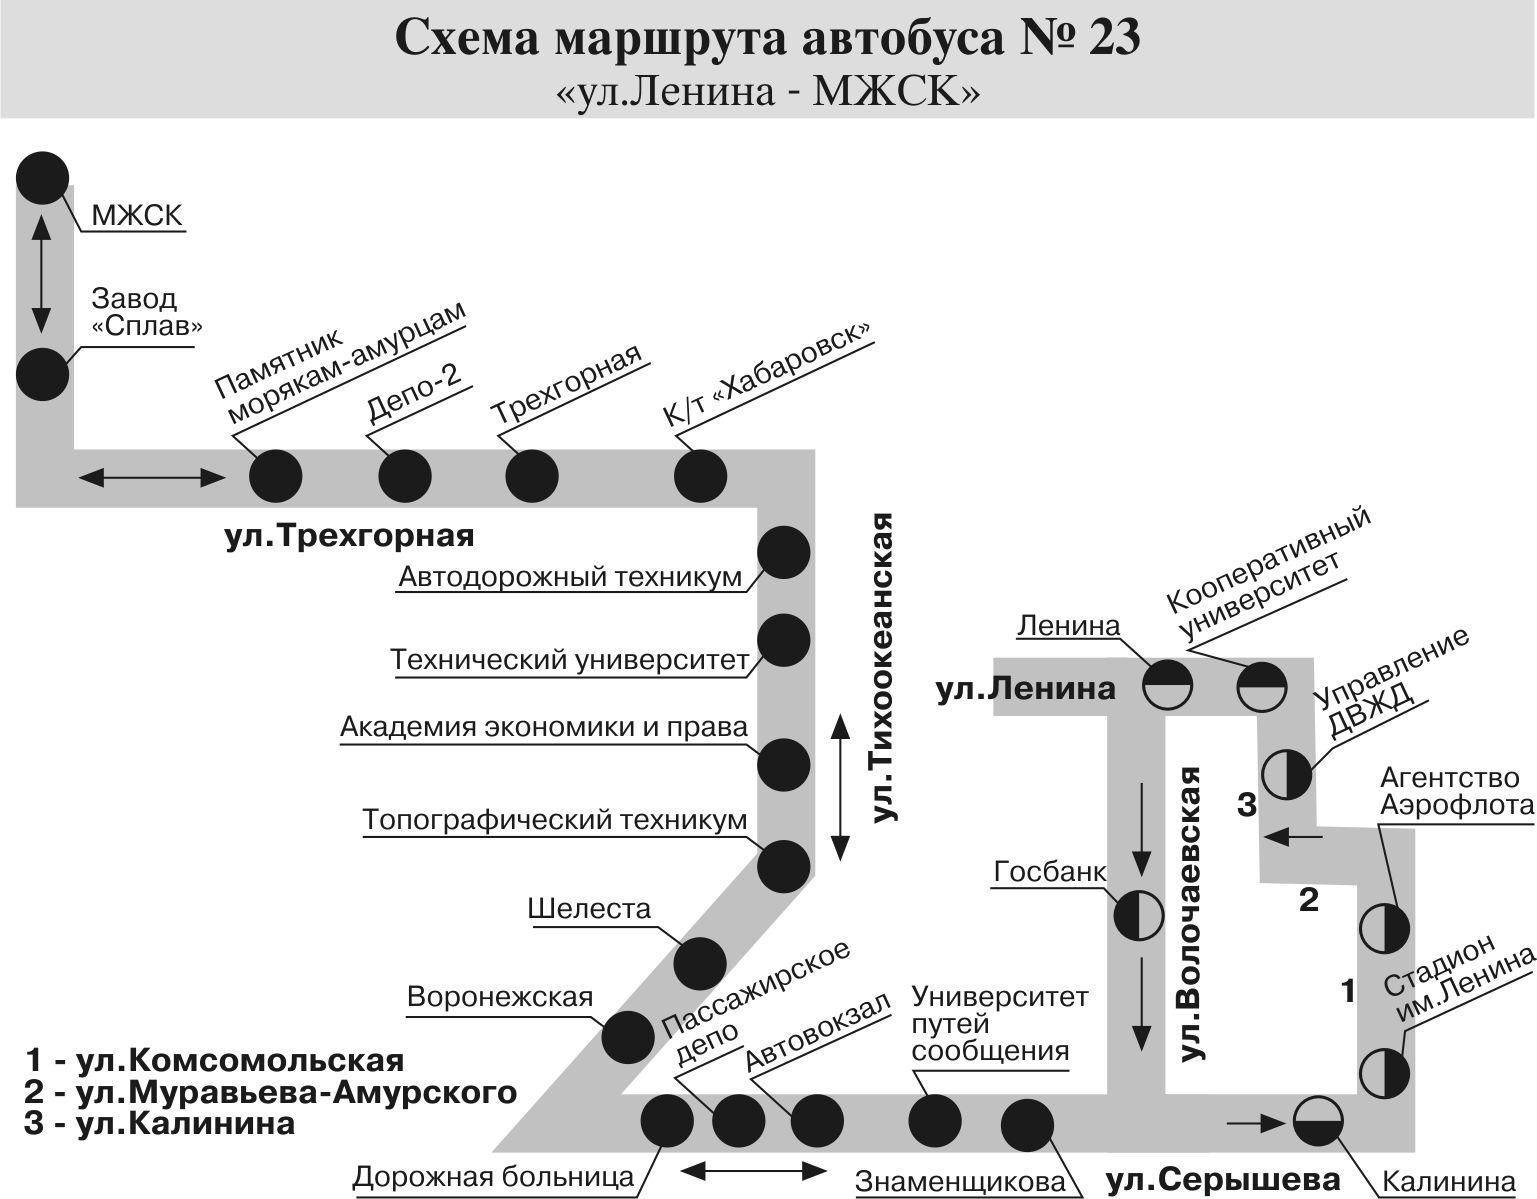 маршрут 23